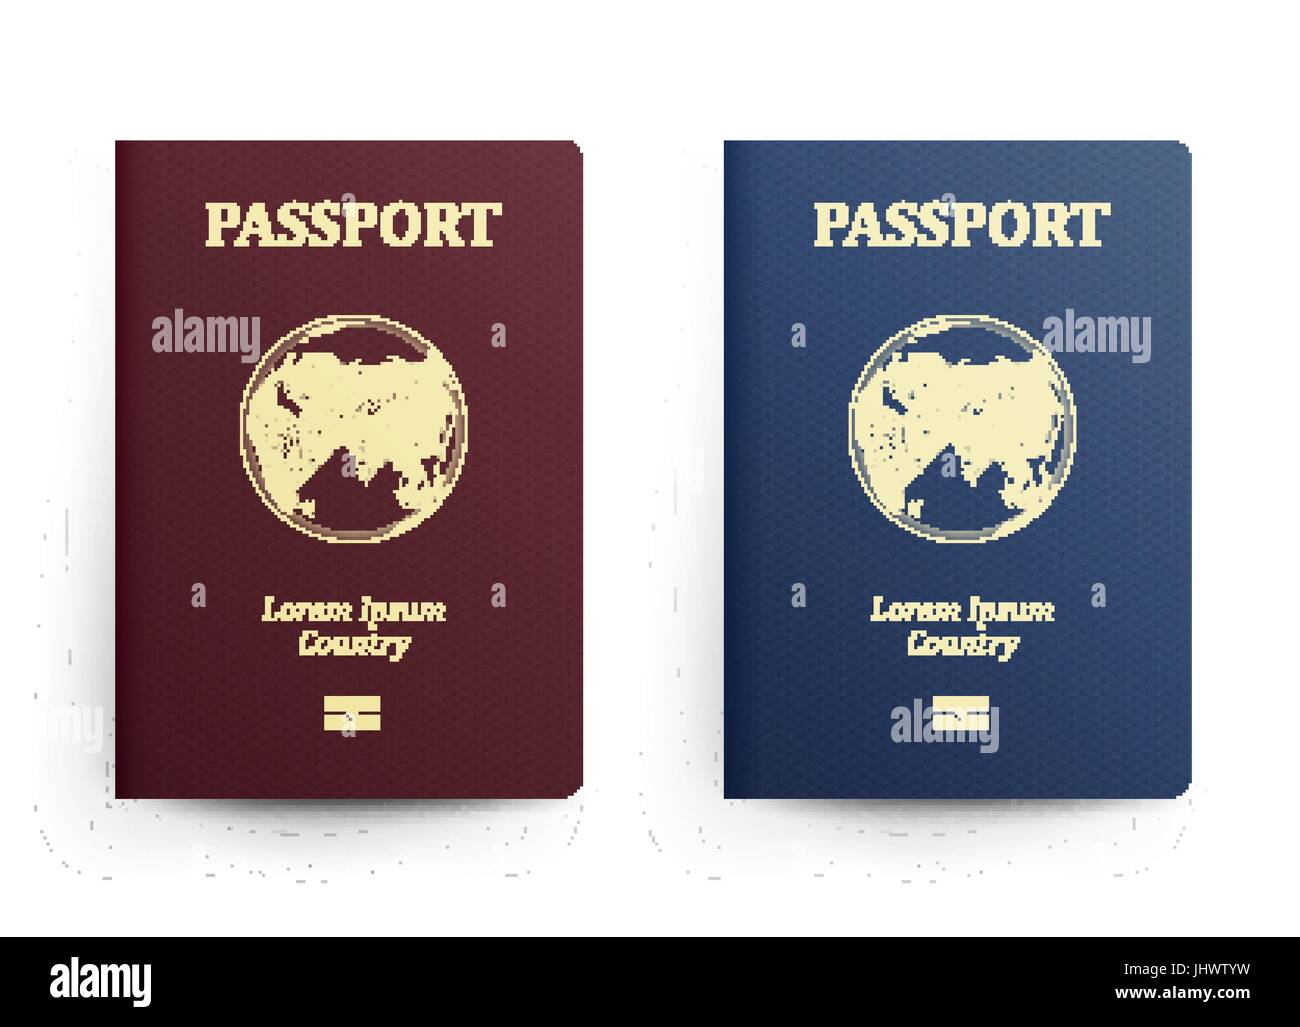 Passport Cover Imágenes De Stock & Passport Cover Fotos De Stock ...